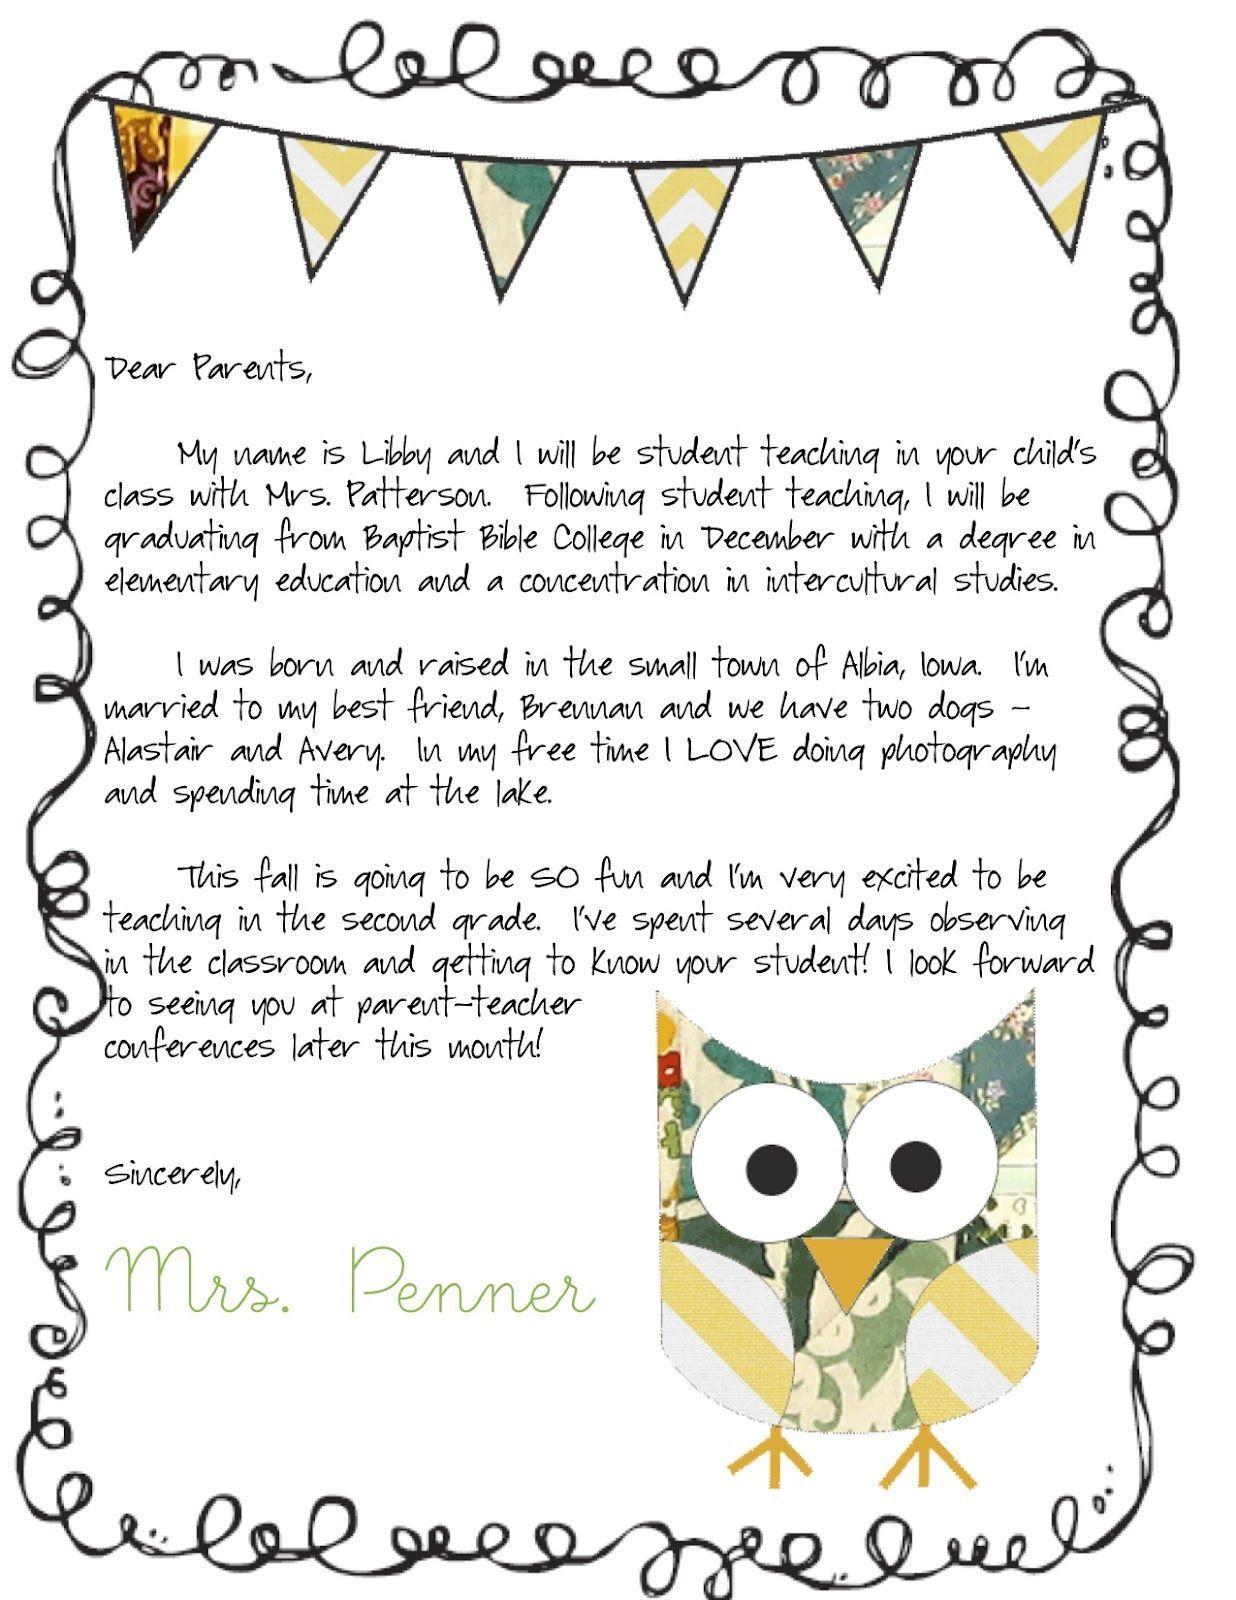 006-unique-pre-welcome-letter-template-ideas Japanese Welcome Letter Template on dental new patient, new teacher, site visit, back school, free parent, existing customer, high school, interior design,